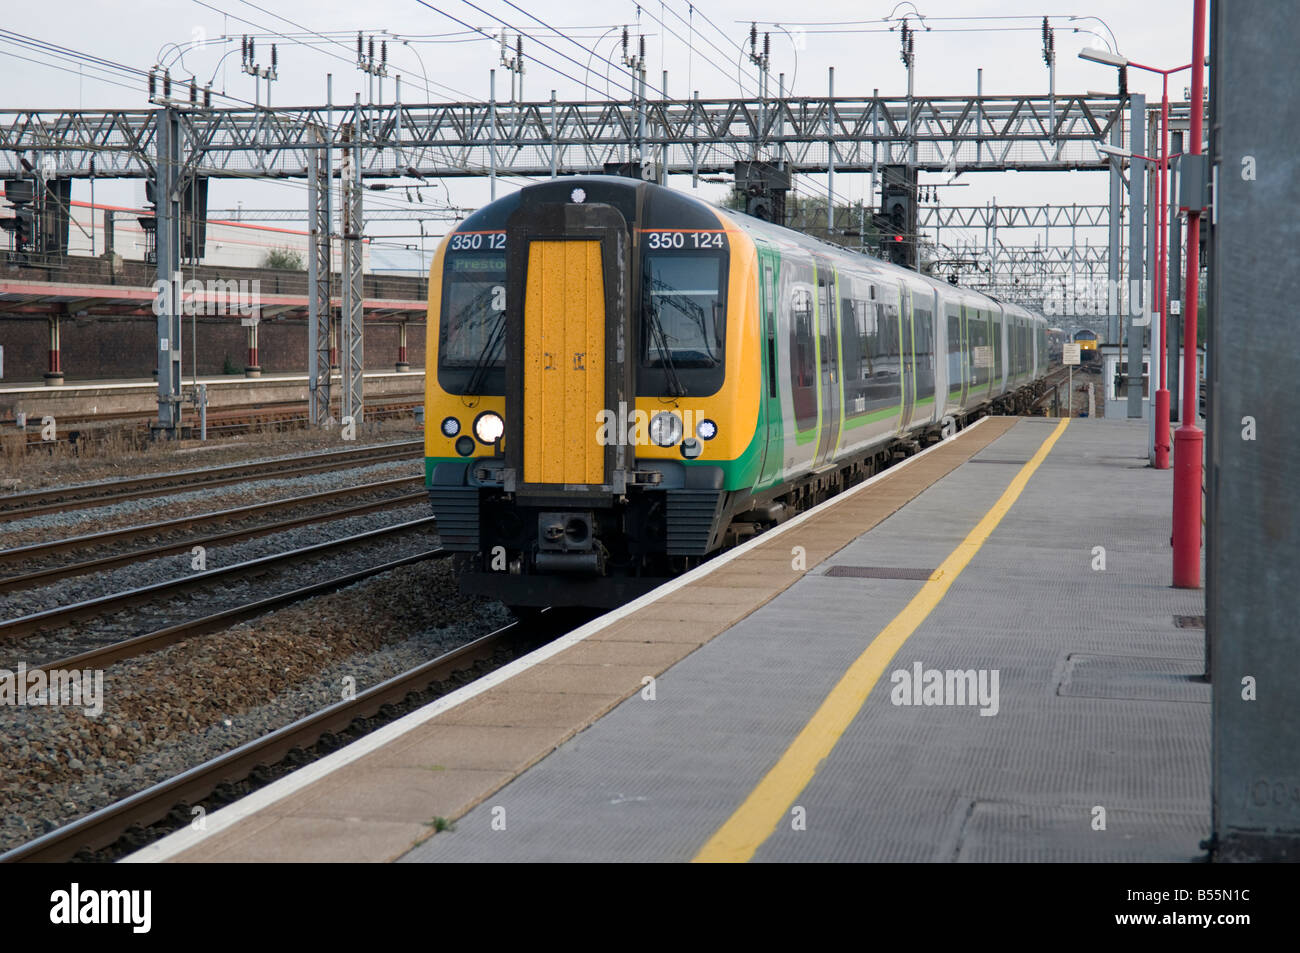 London Midland railway commuter Train at Crewe railway station UK - Stock Image